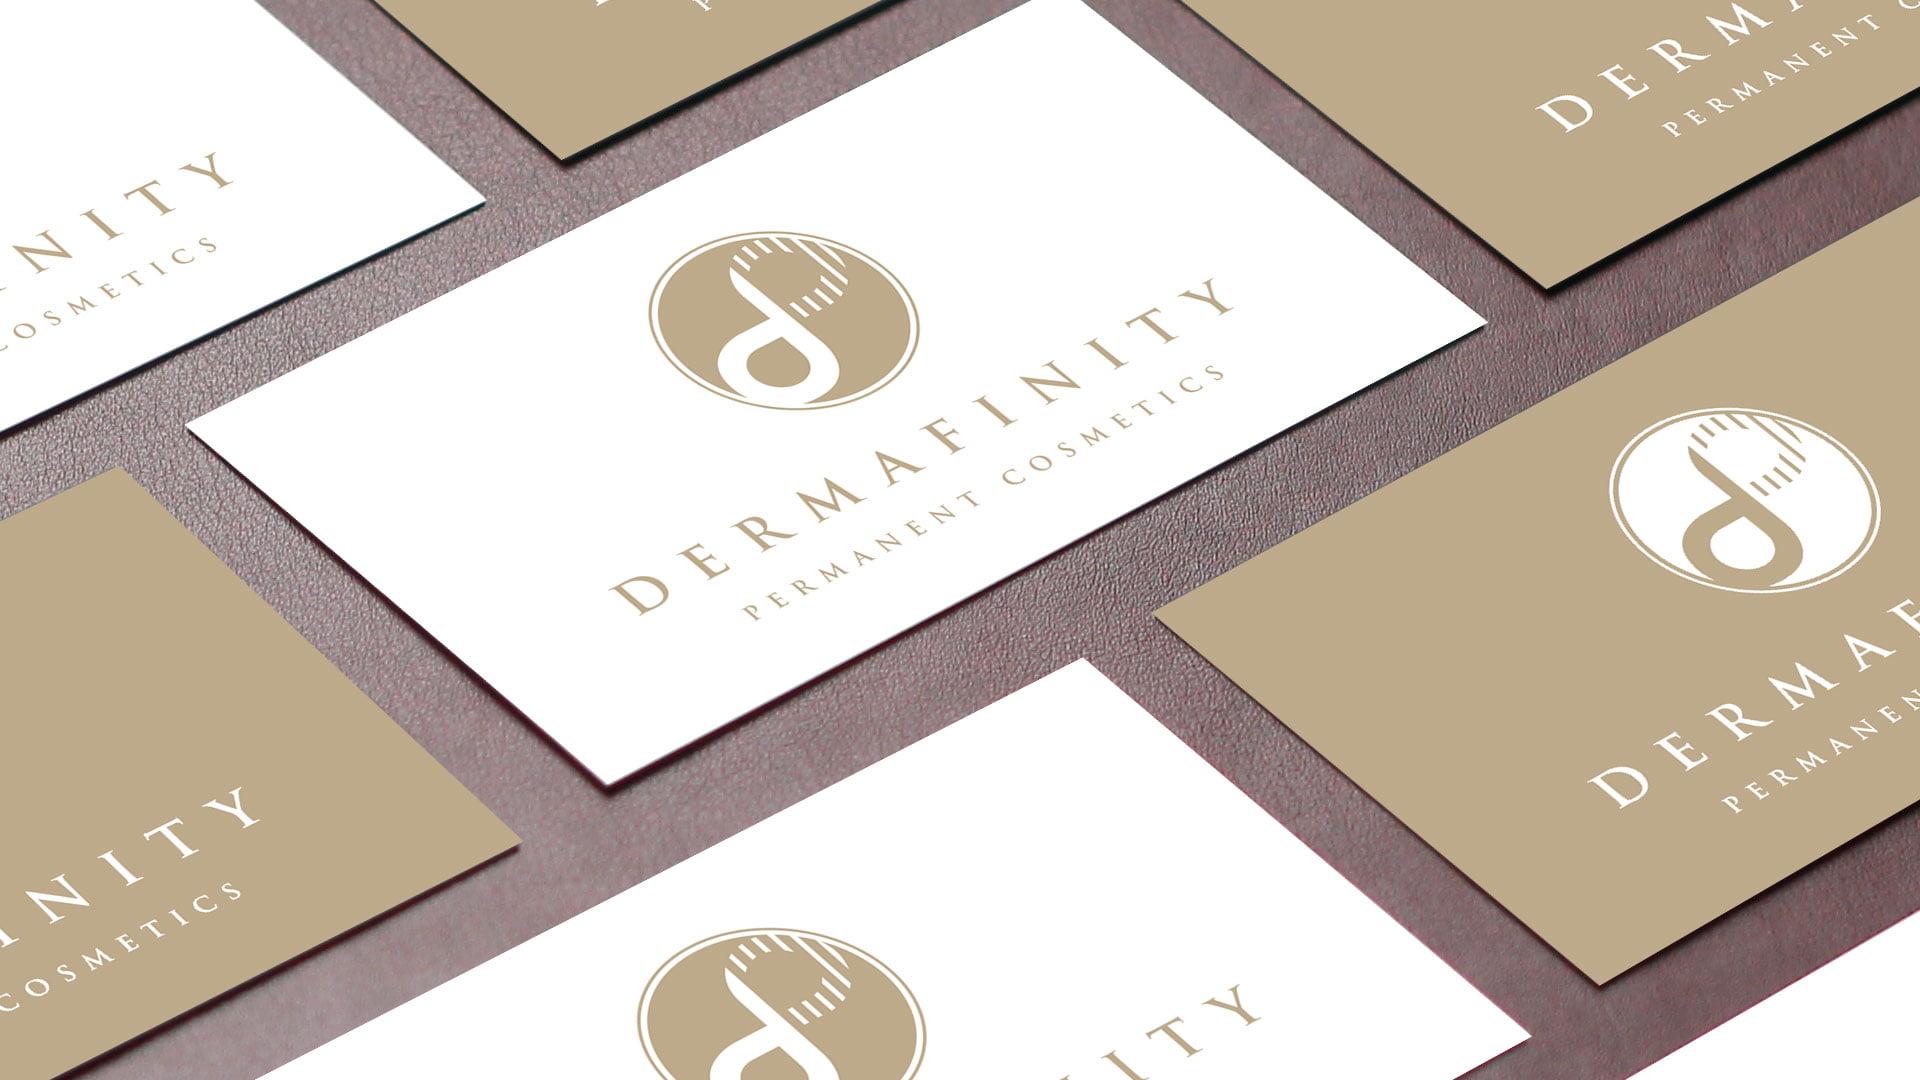 Dermafinity business card design